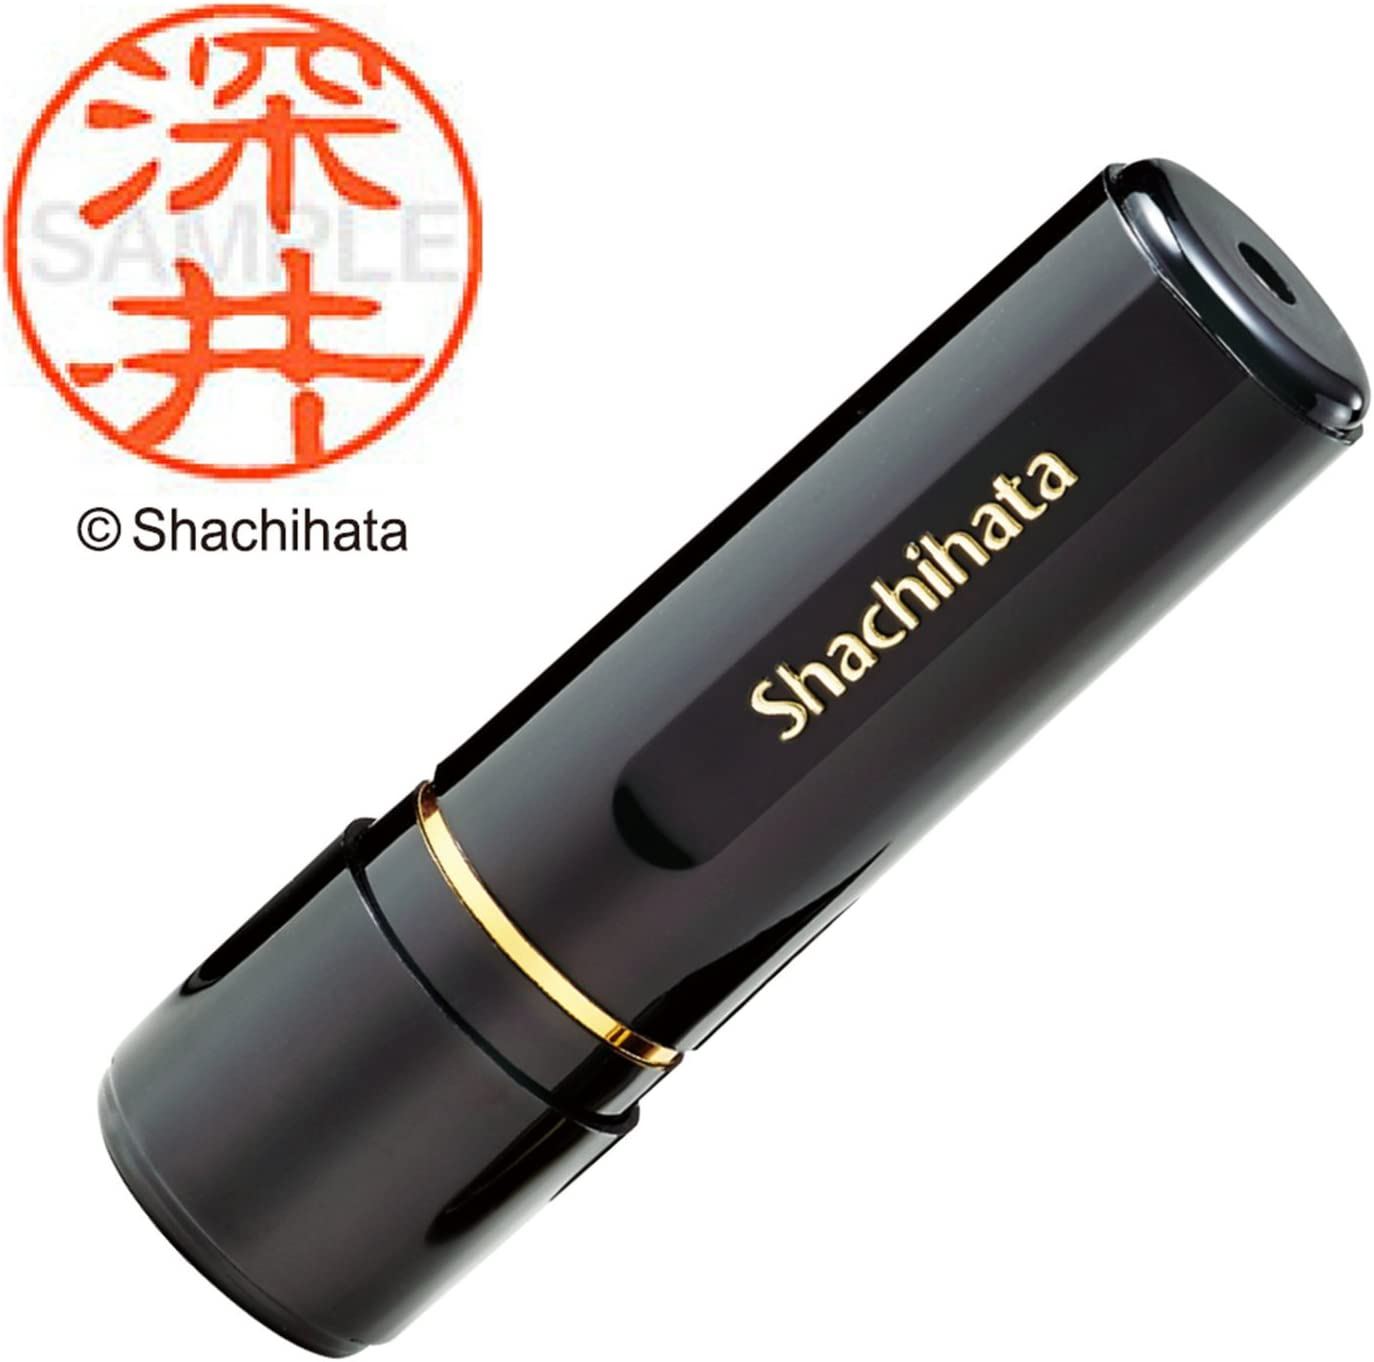 Shachihata 11 black face of a seal mm Deep impor japan Max 73% OFF mart XL-11